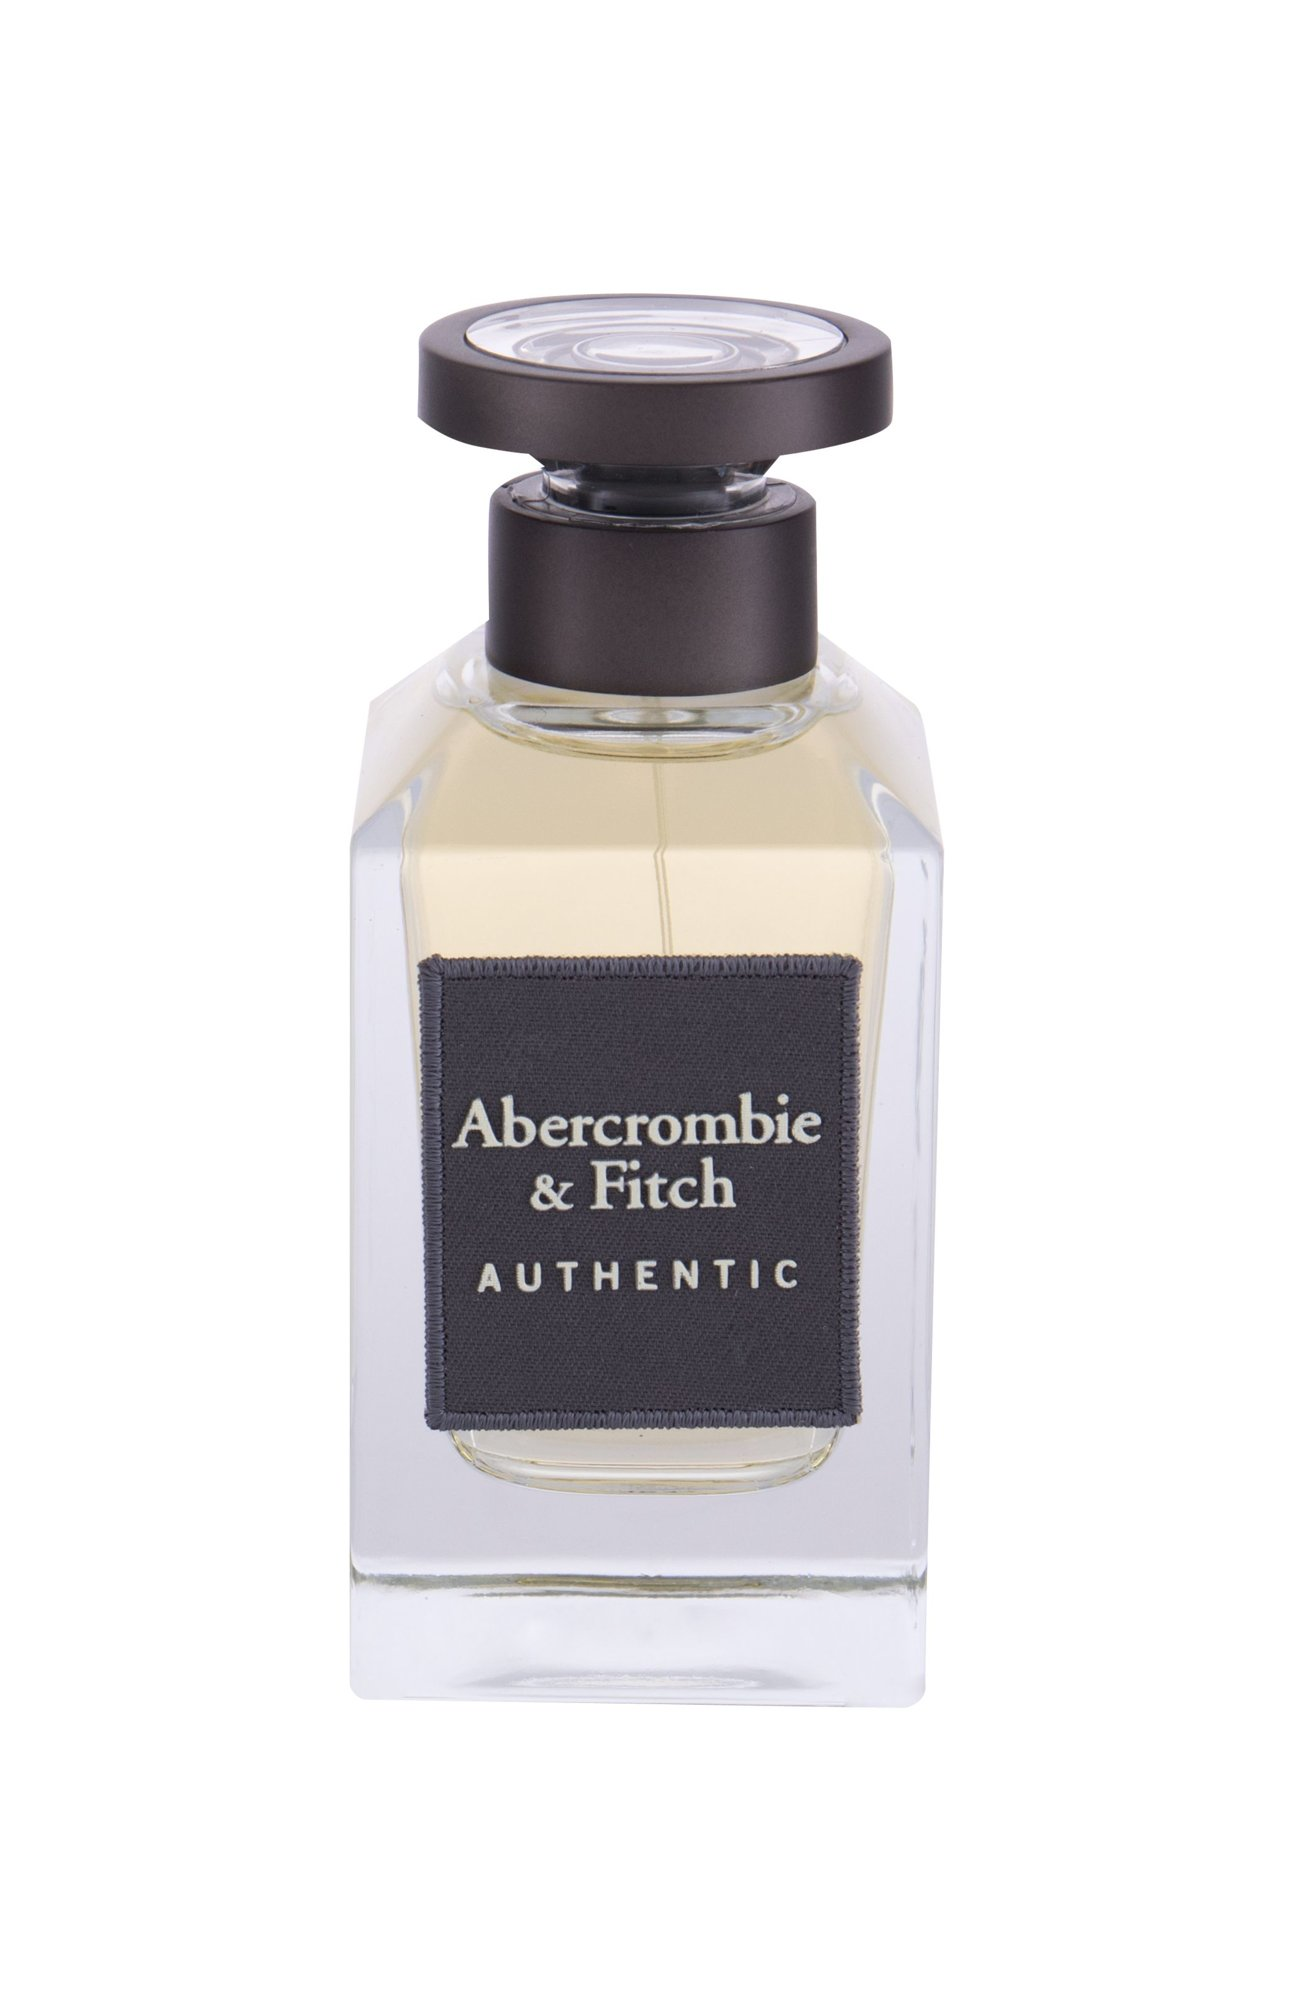 Abercrombie & Fitch Authentic, Toaletná voda 100ml